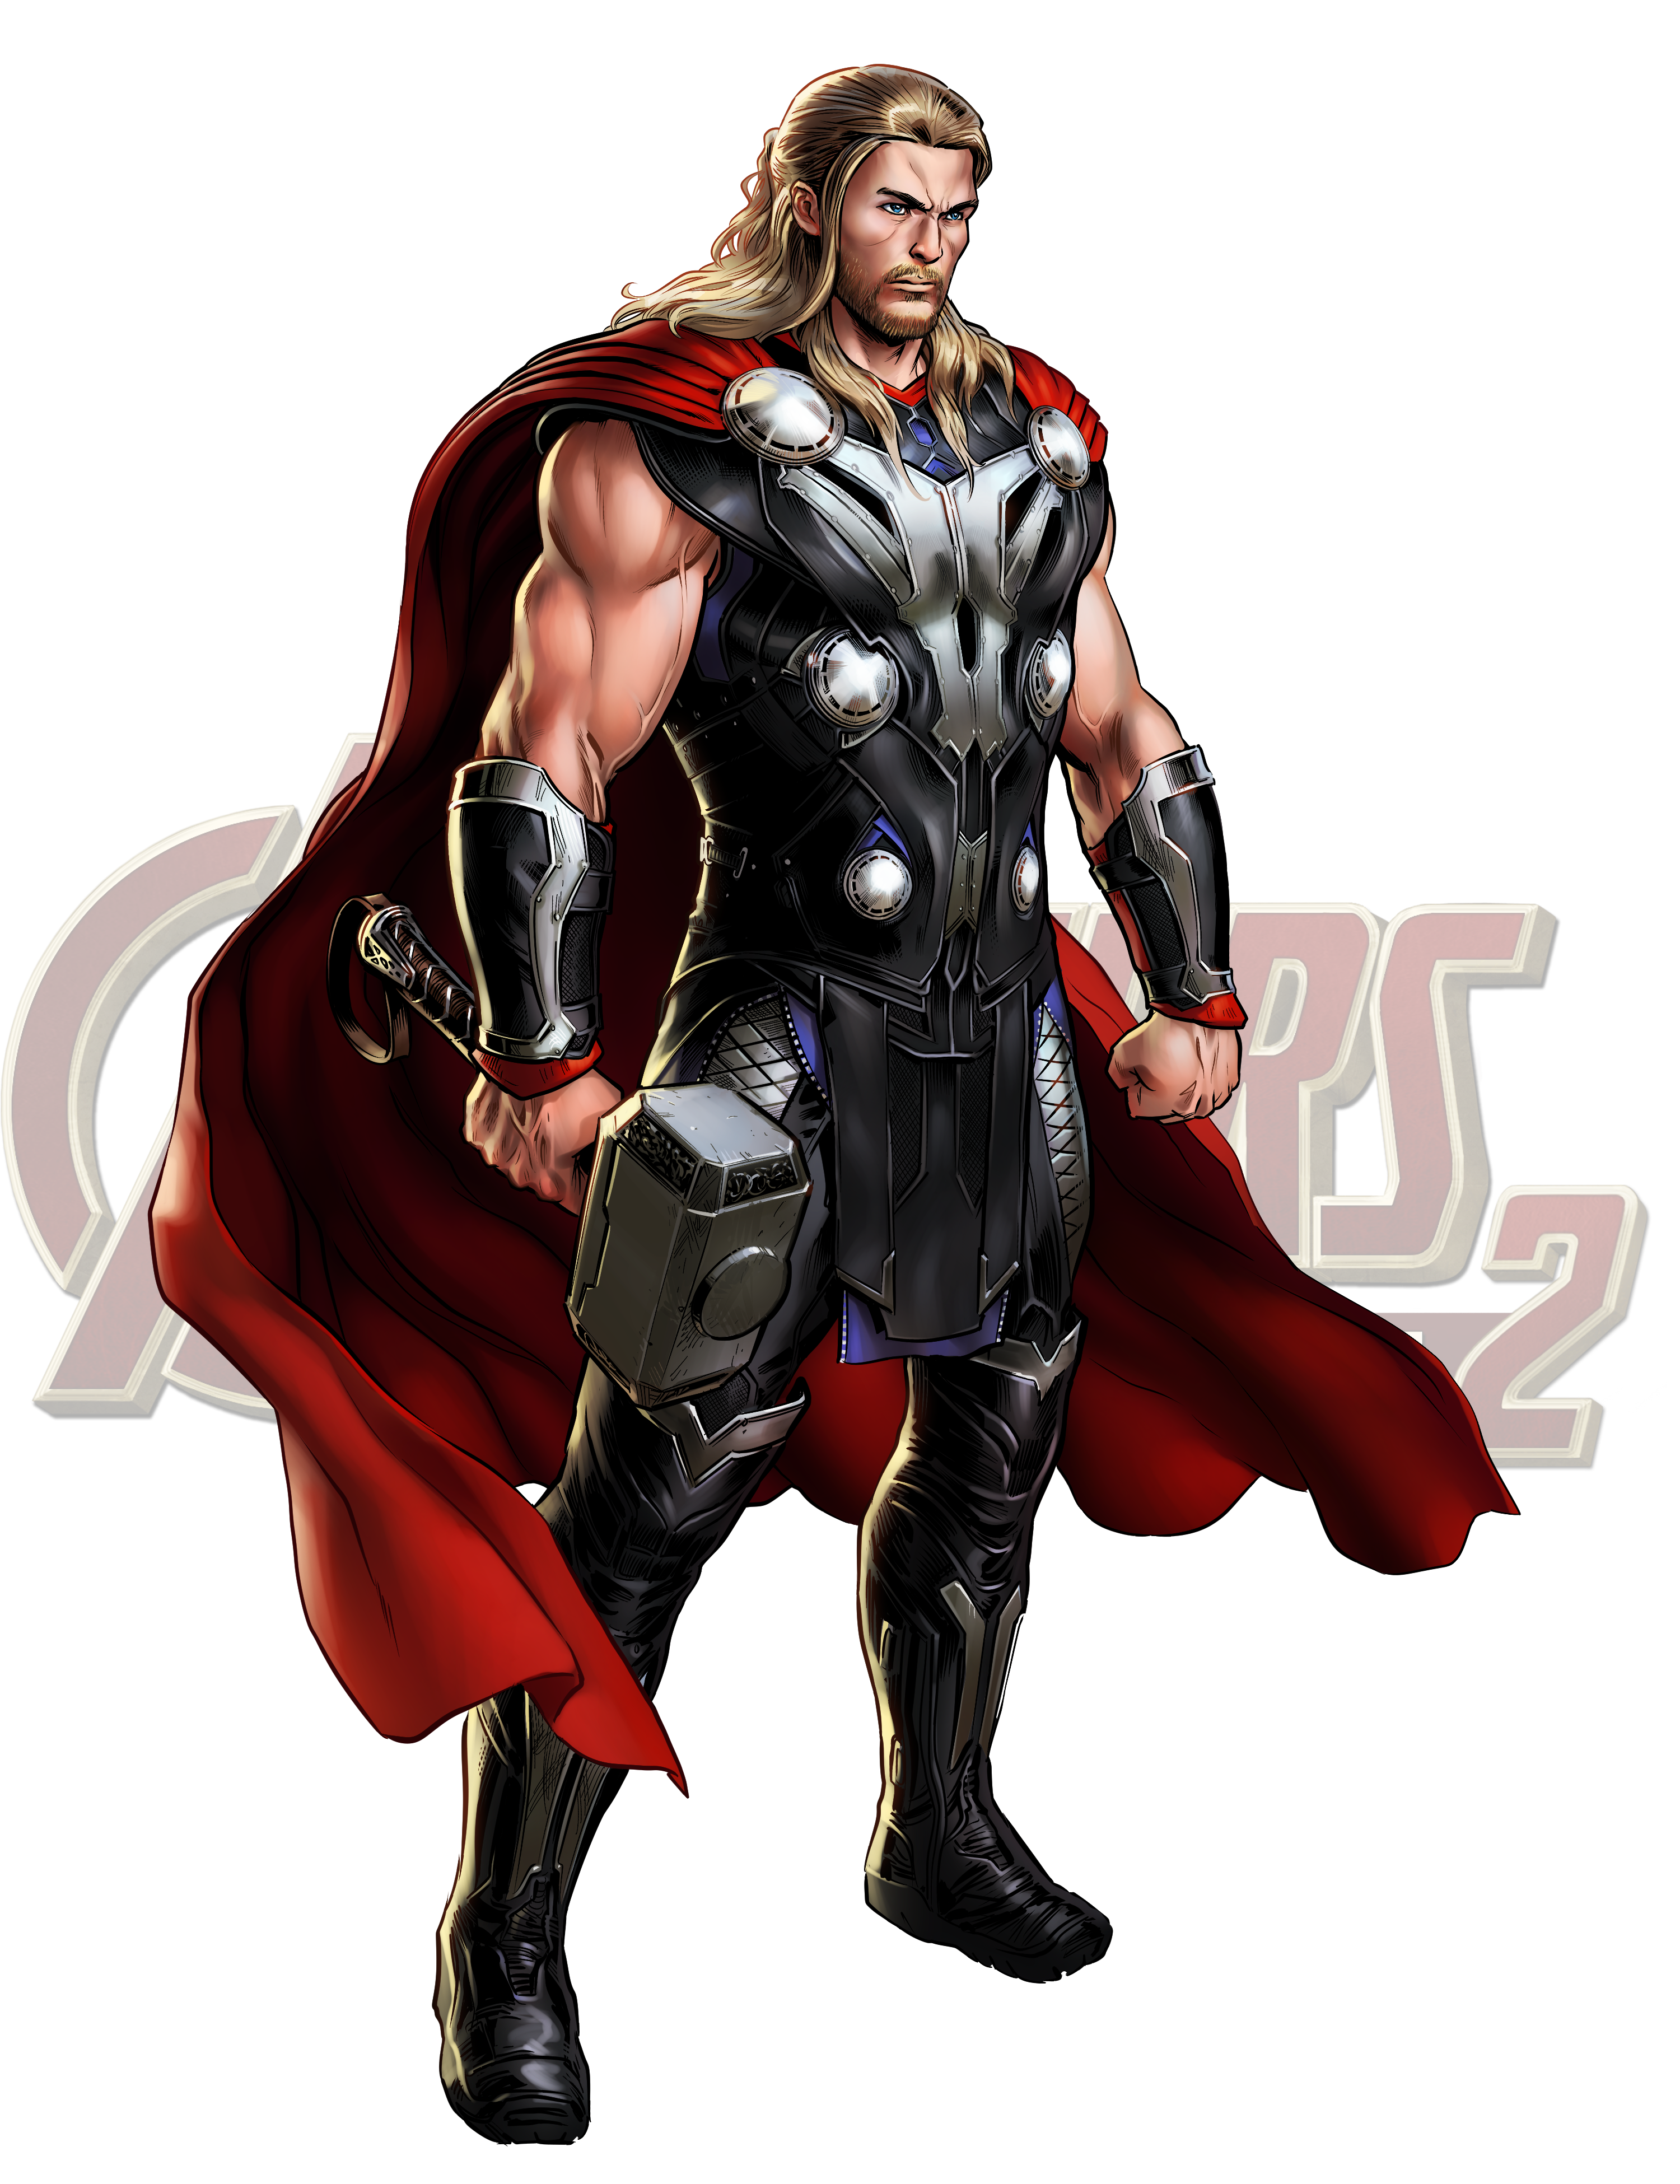 age of ultron thor marvel avengers alliance 2 wikia fandom